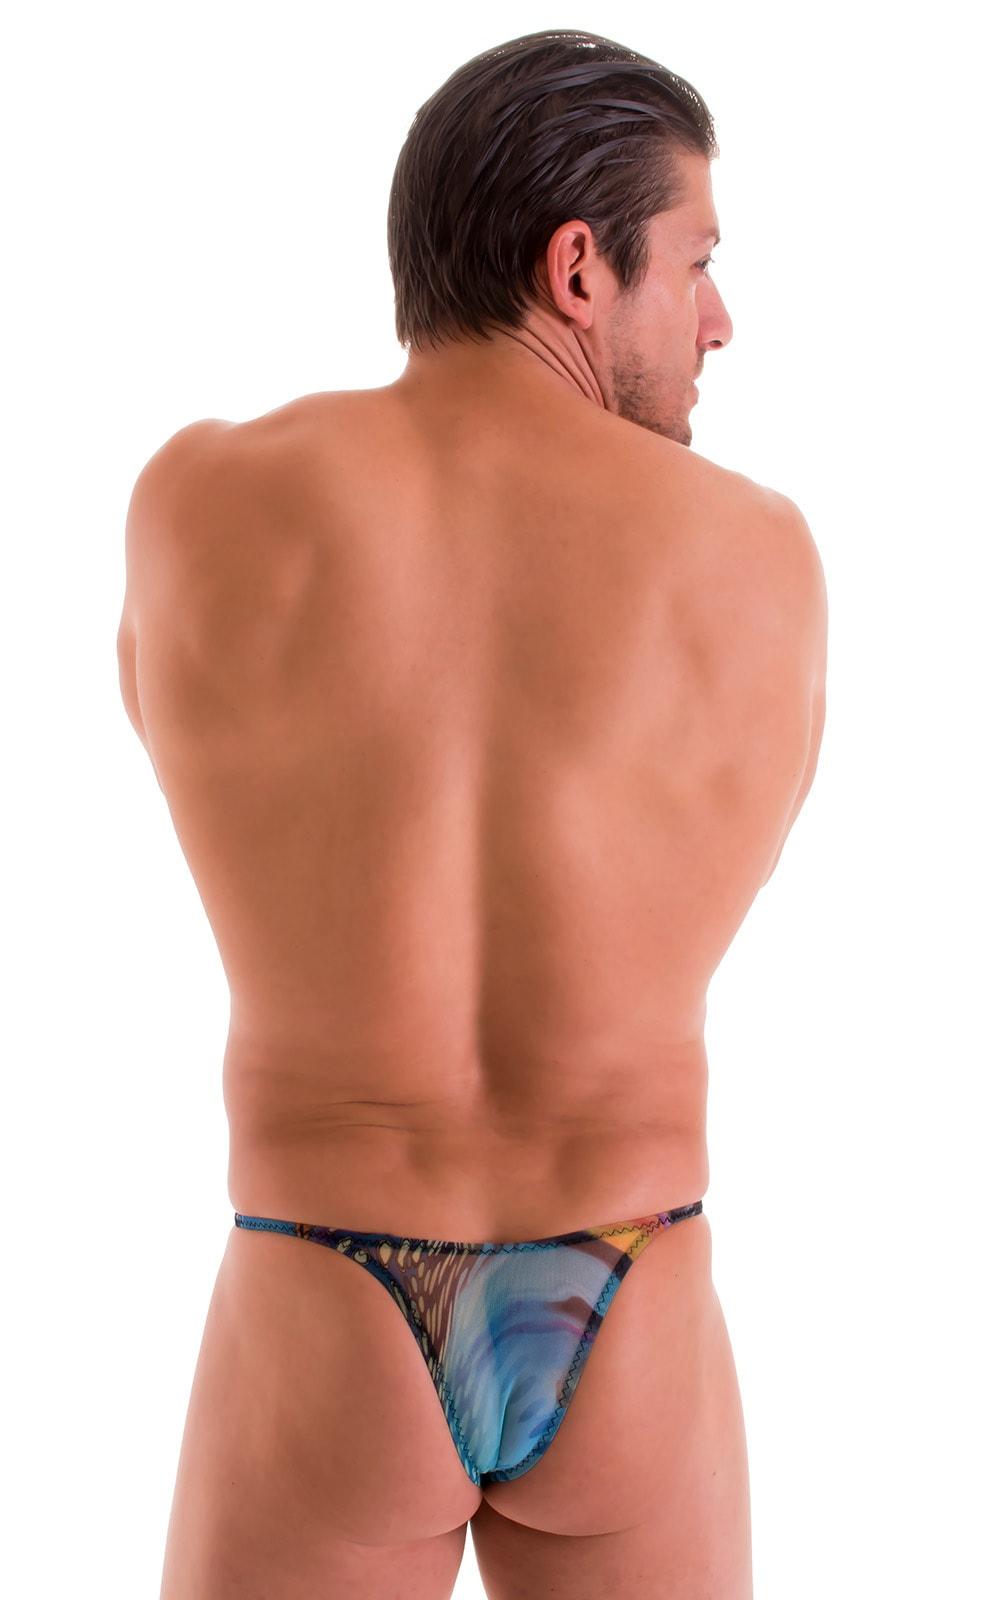 Sunseeker Micro Pouch Half Back Bikini in Semi Sheer Aquarious Printed Mesh 3